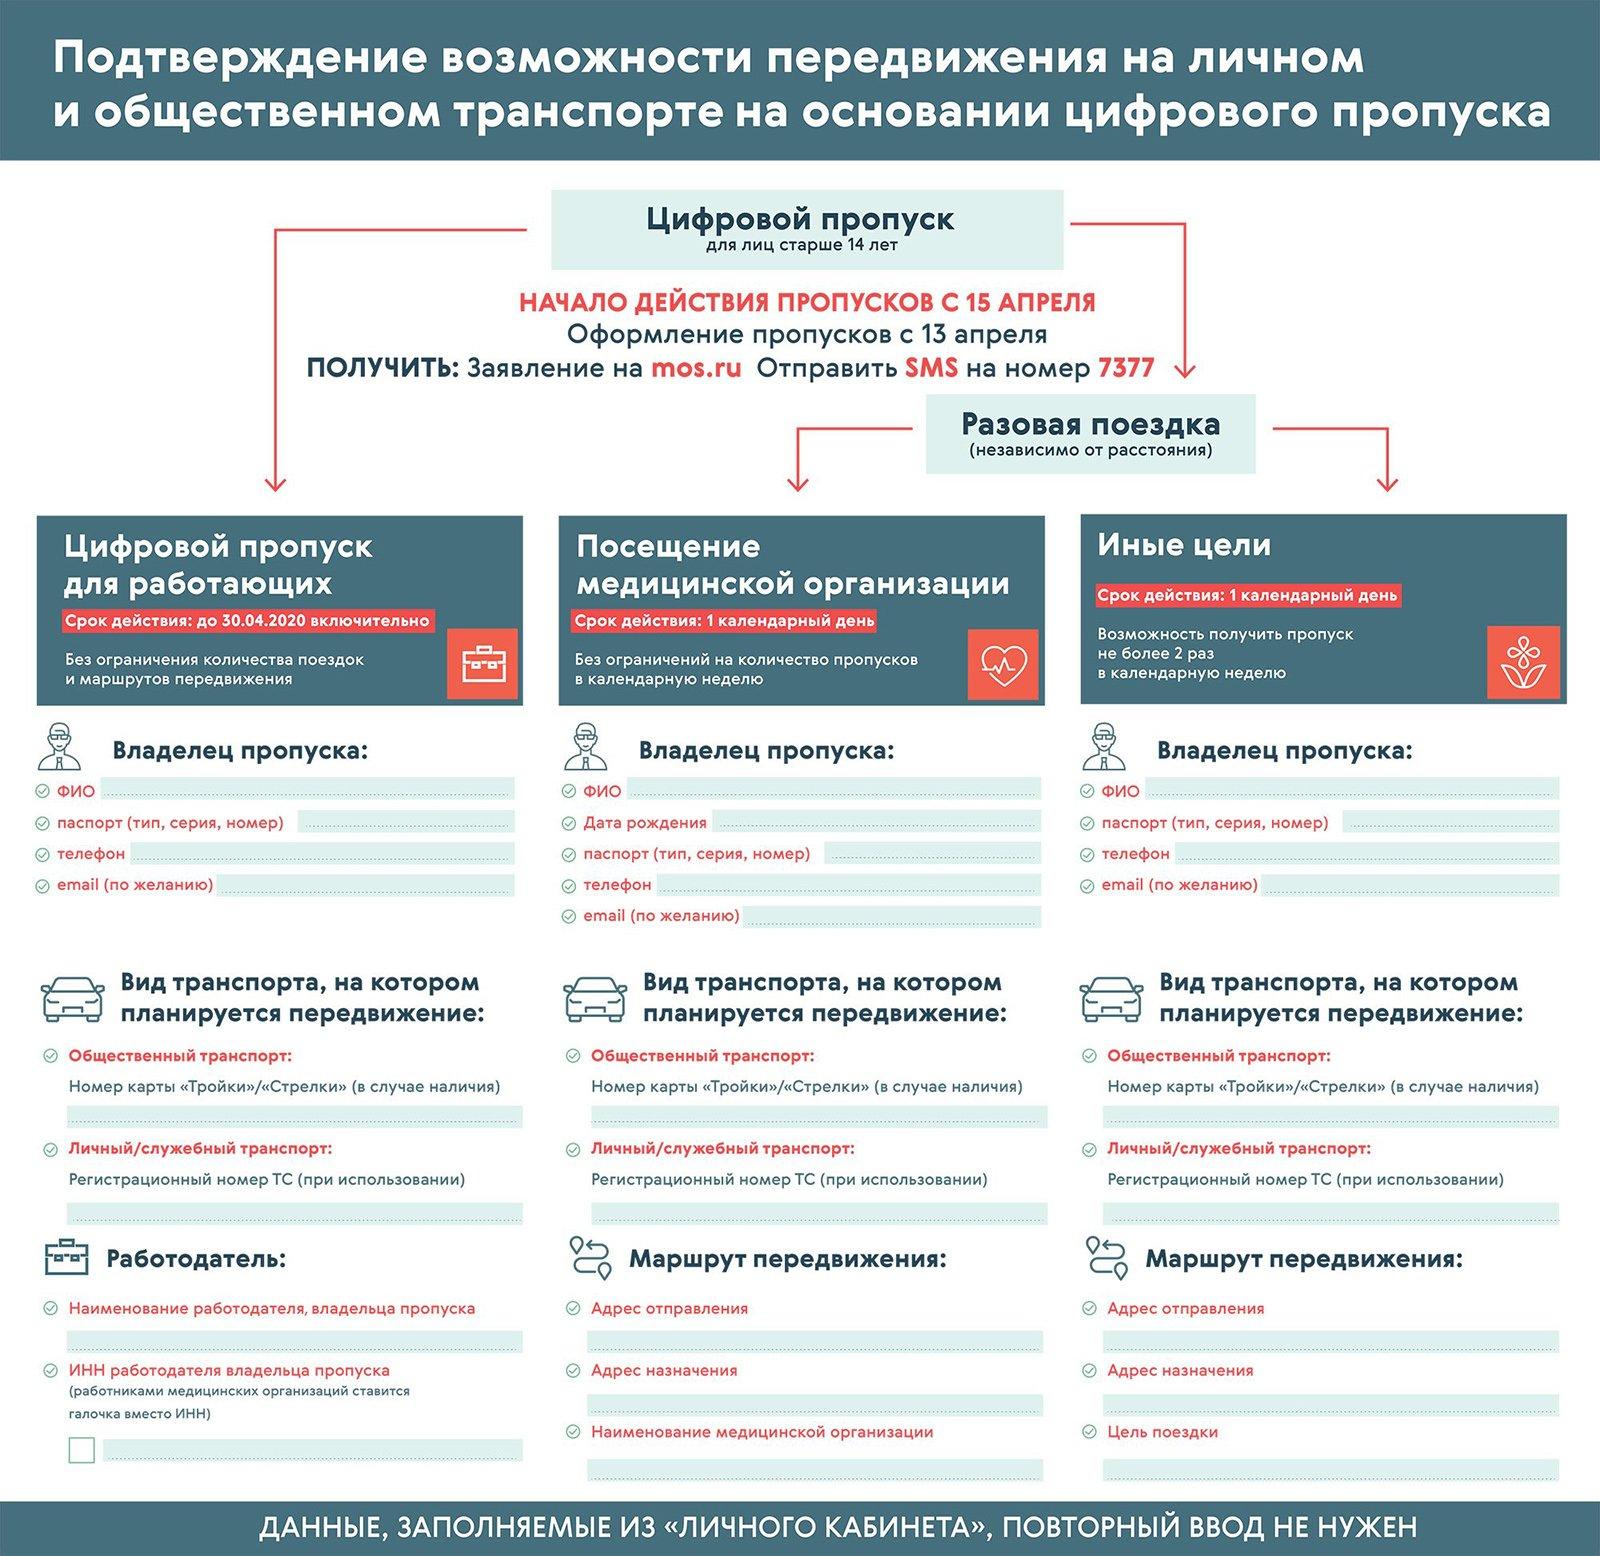 propysk_mos.jpg